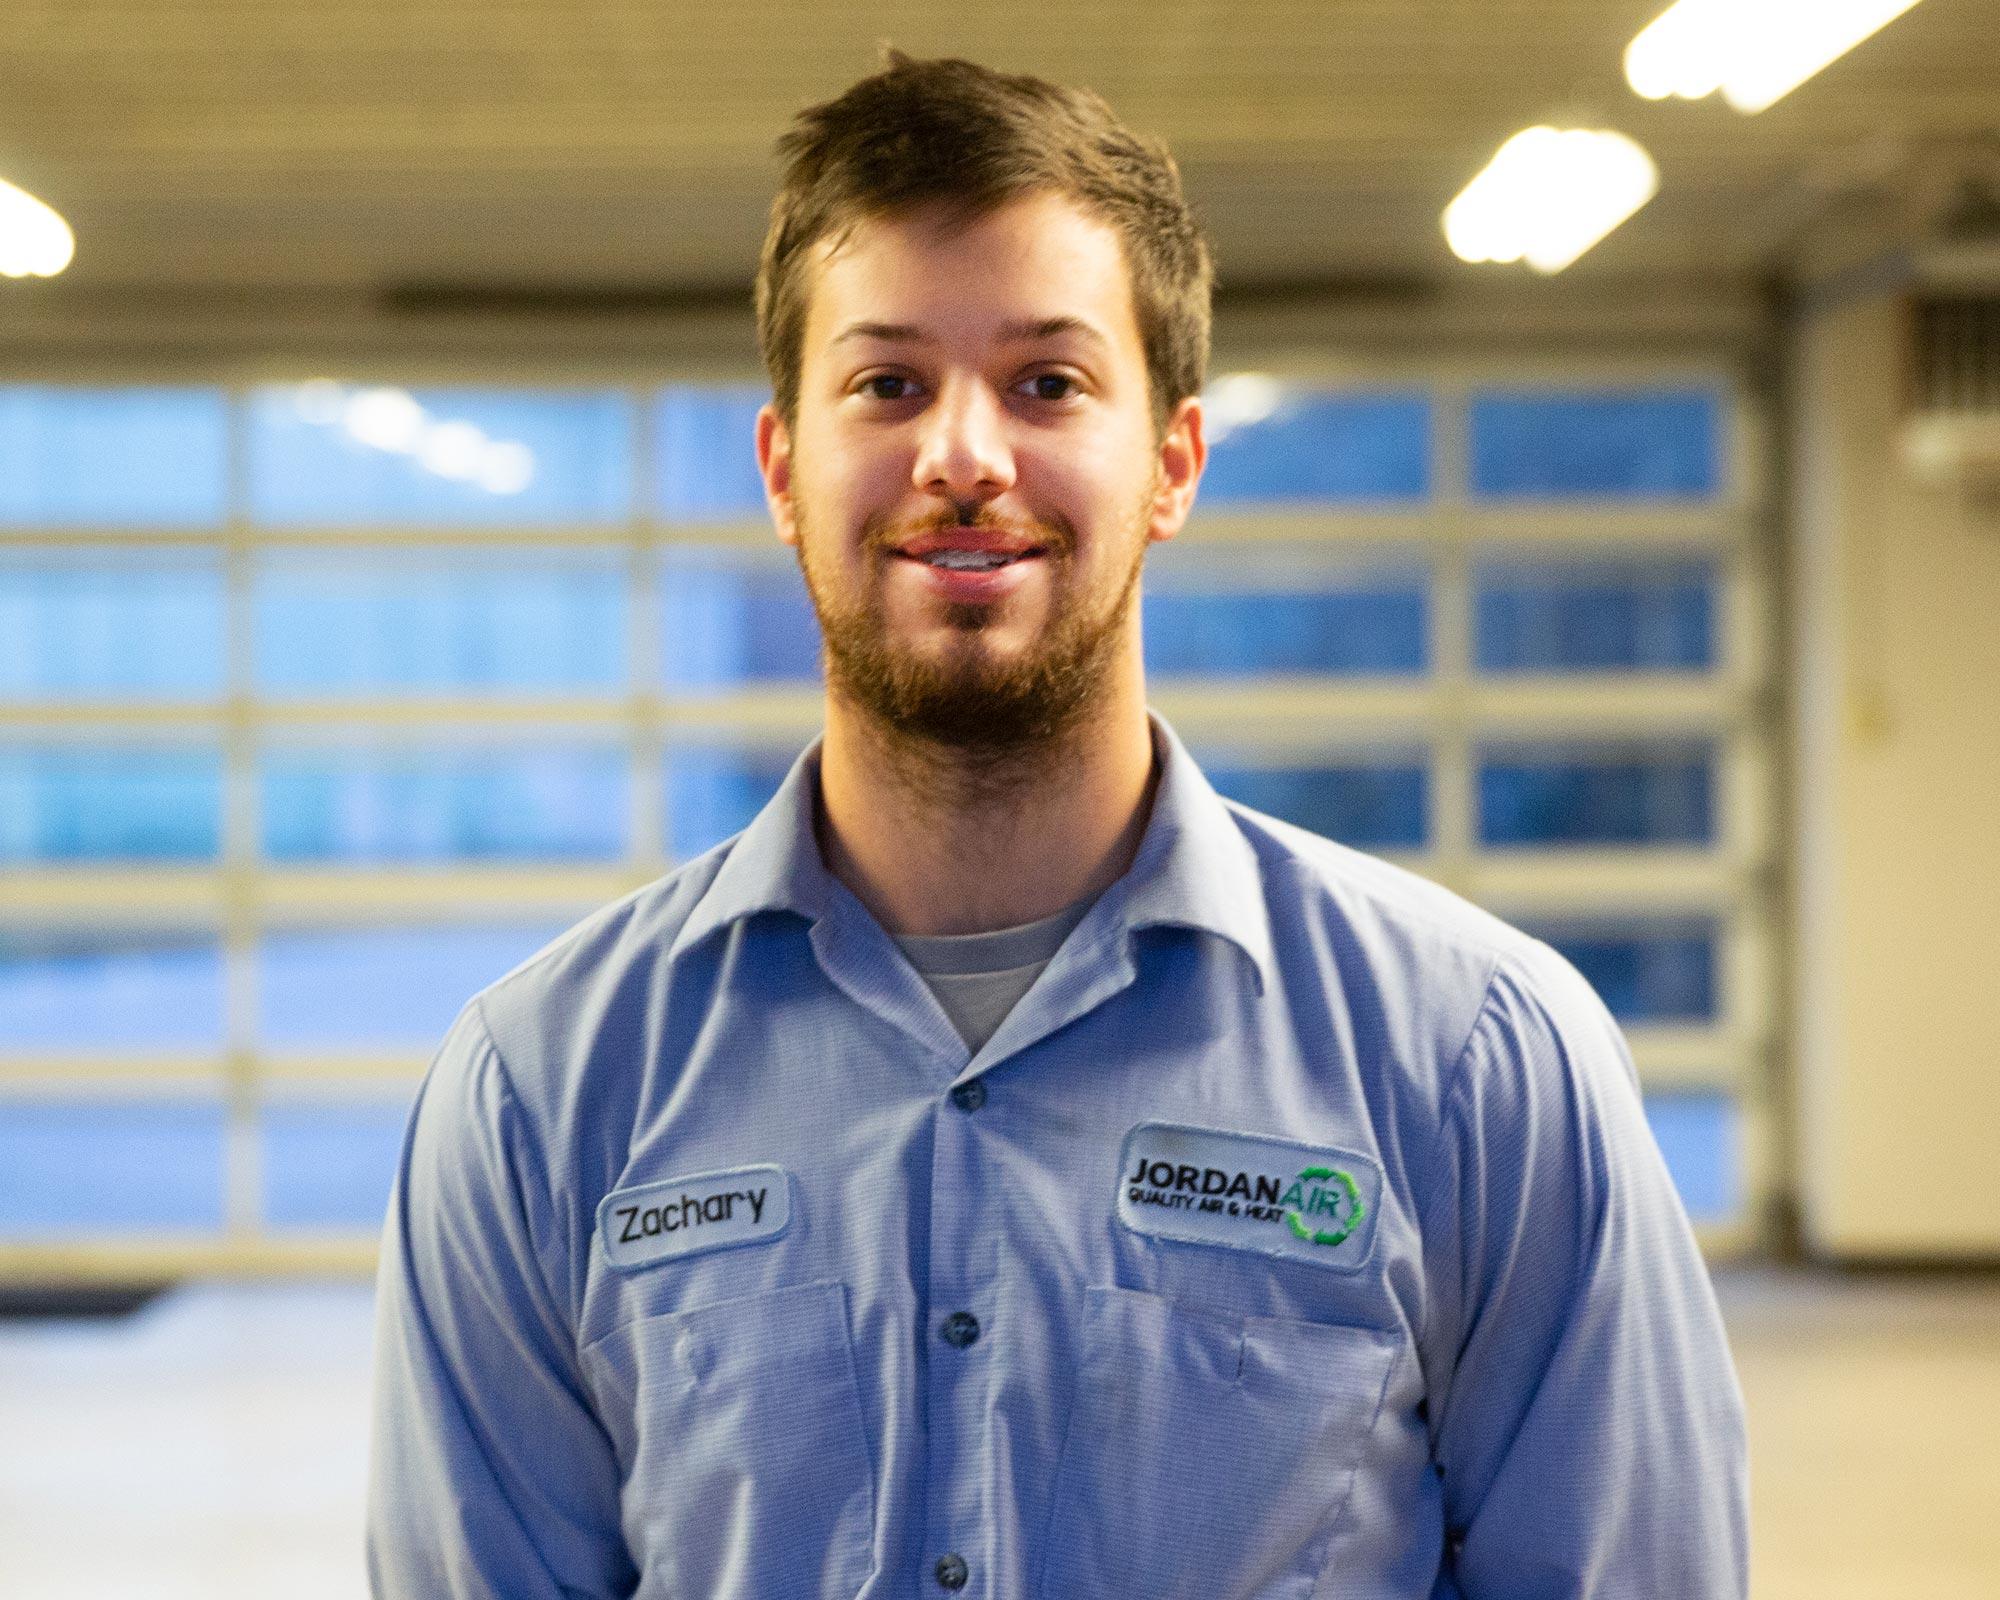 Zack-Goodman-(Service-Technician).jpg